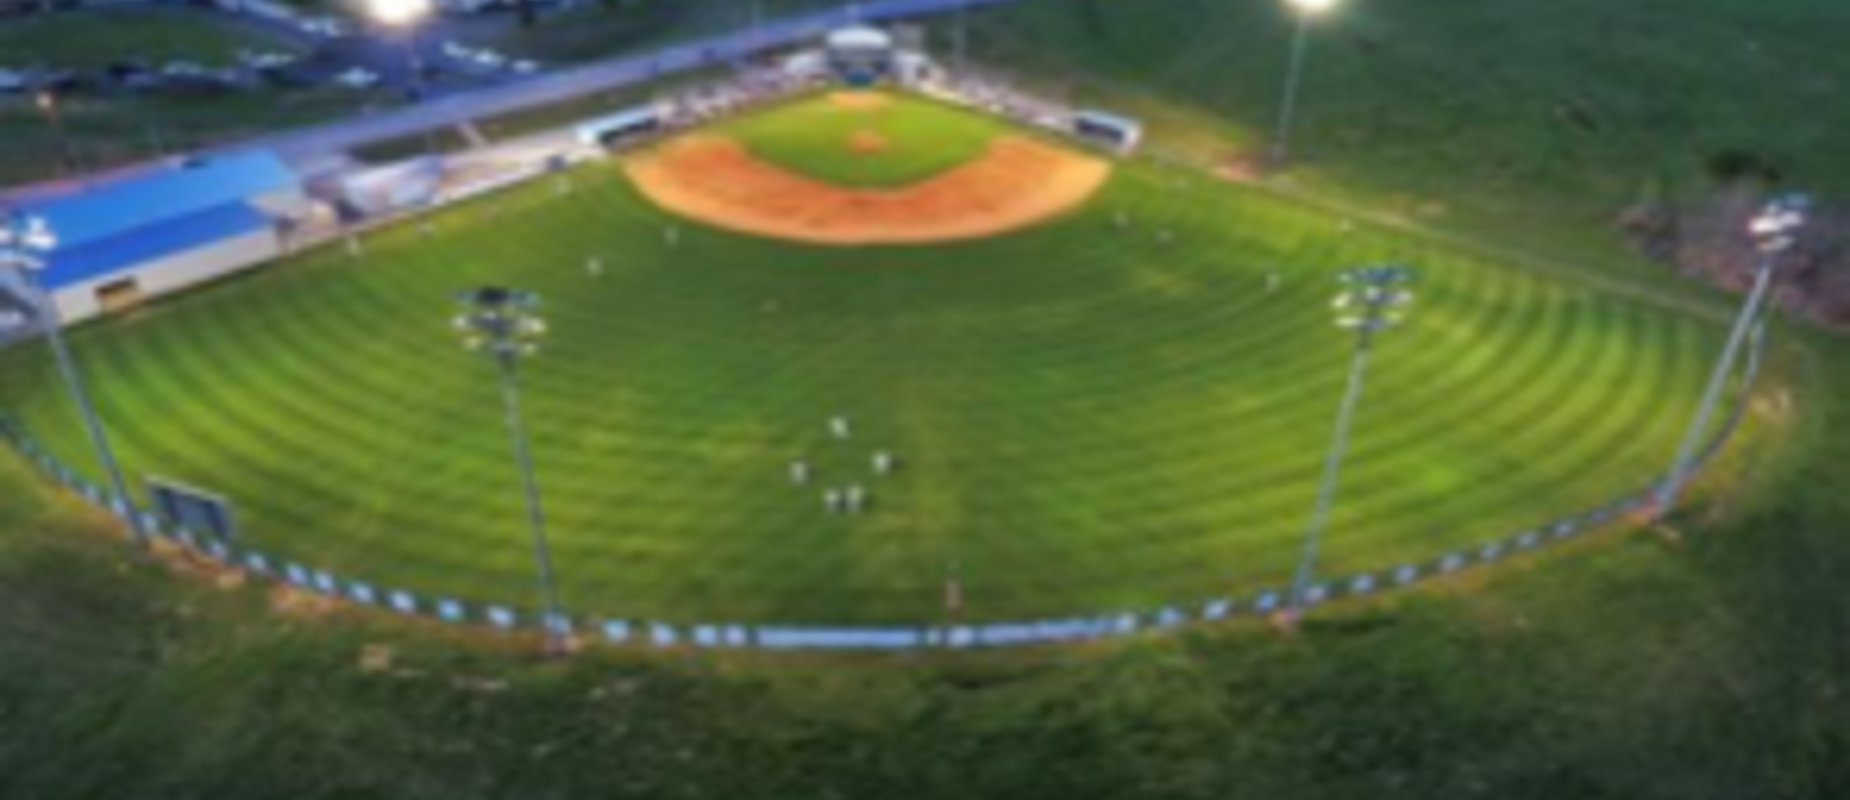 Baseball Field Lighted